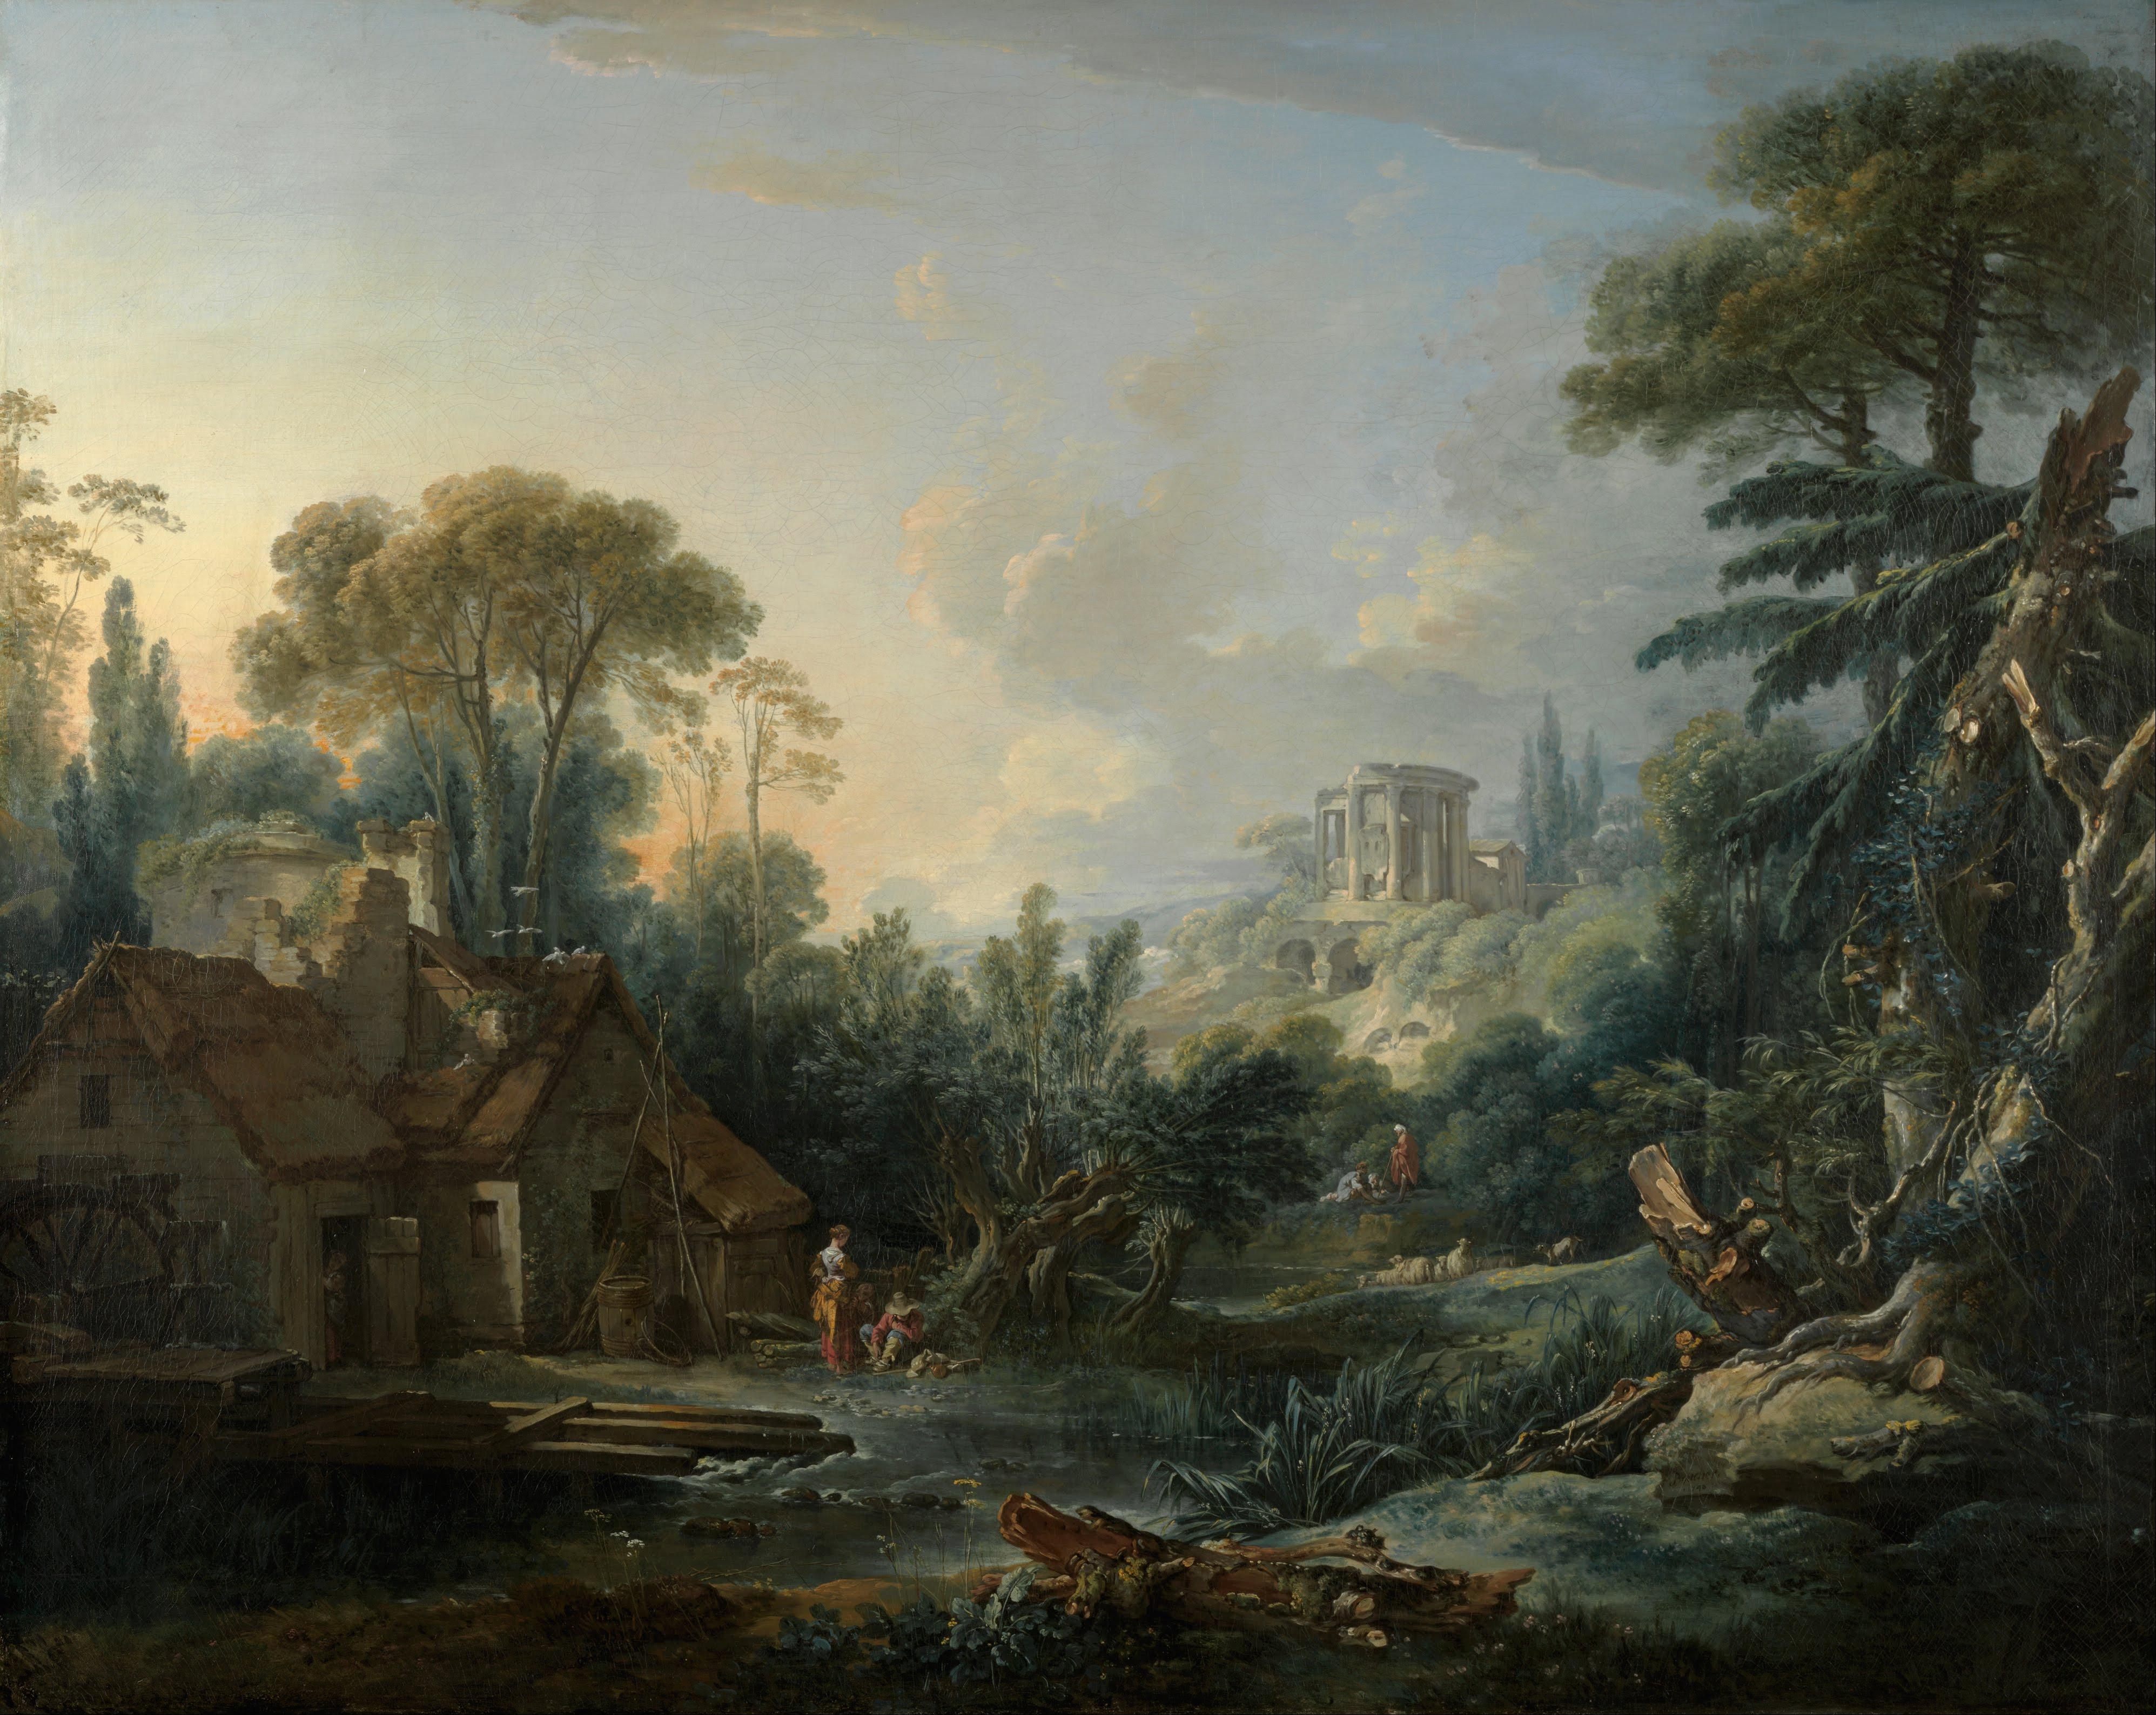 François_Boucher_-_Landscape_with_a_Water_Mill_-_Google_Art_Project